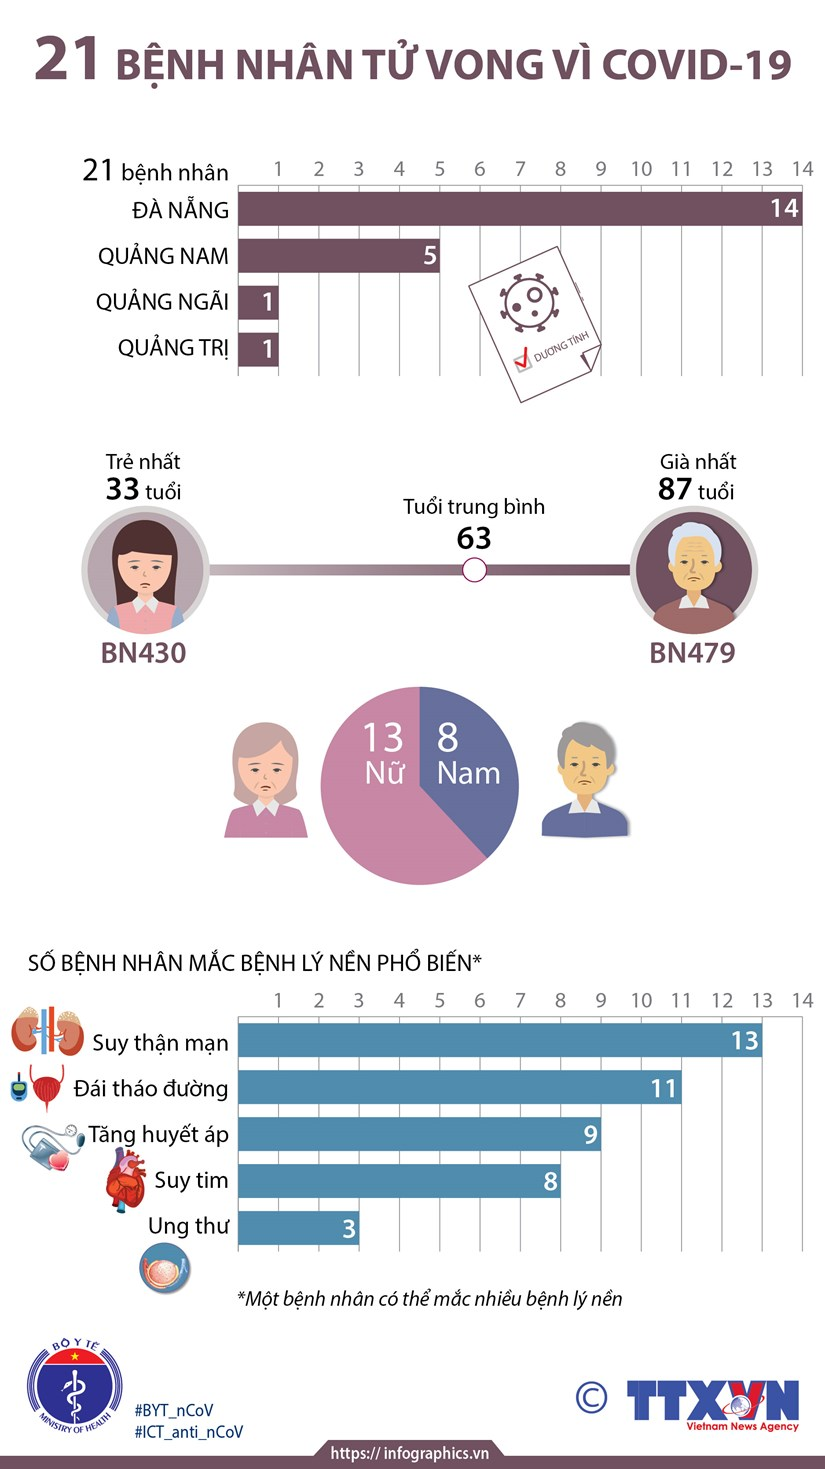 [Infographics] 21 benh nhan tu vong vi COVID-19 tai Viet Nam hinh anh 1